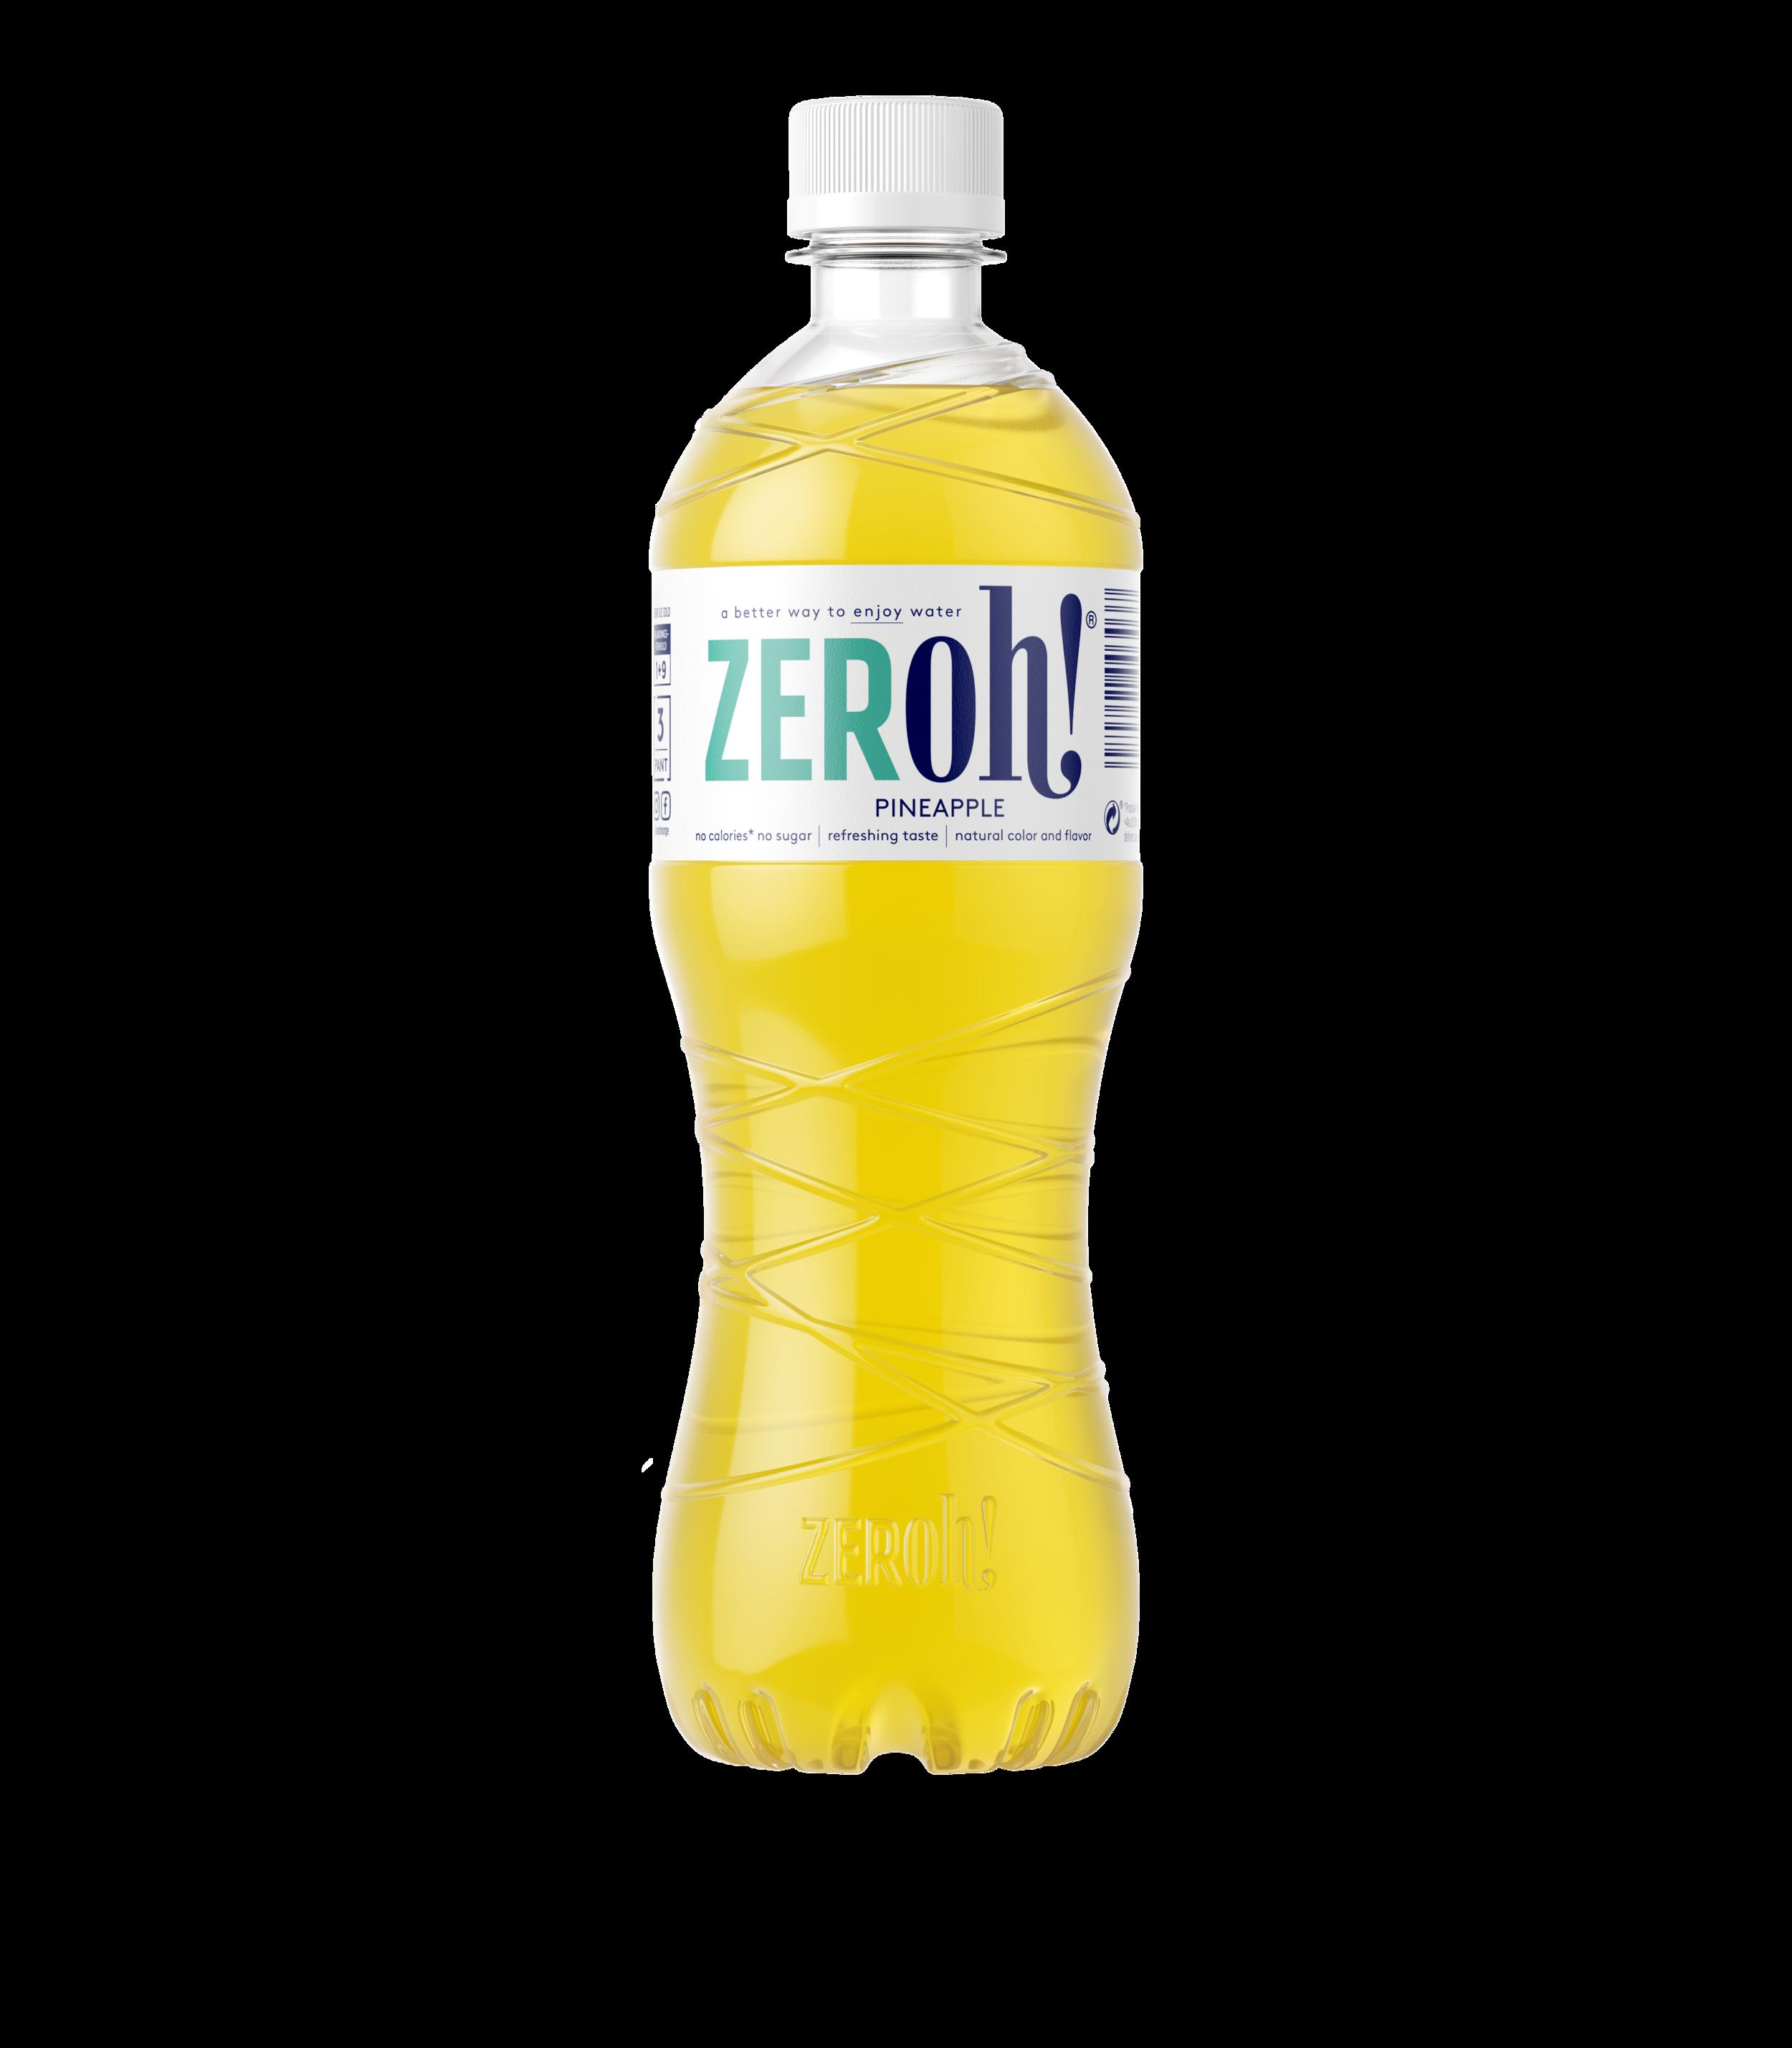 ZERoh! Pineapple 2019 3D transparent.png